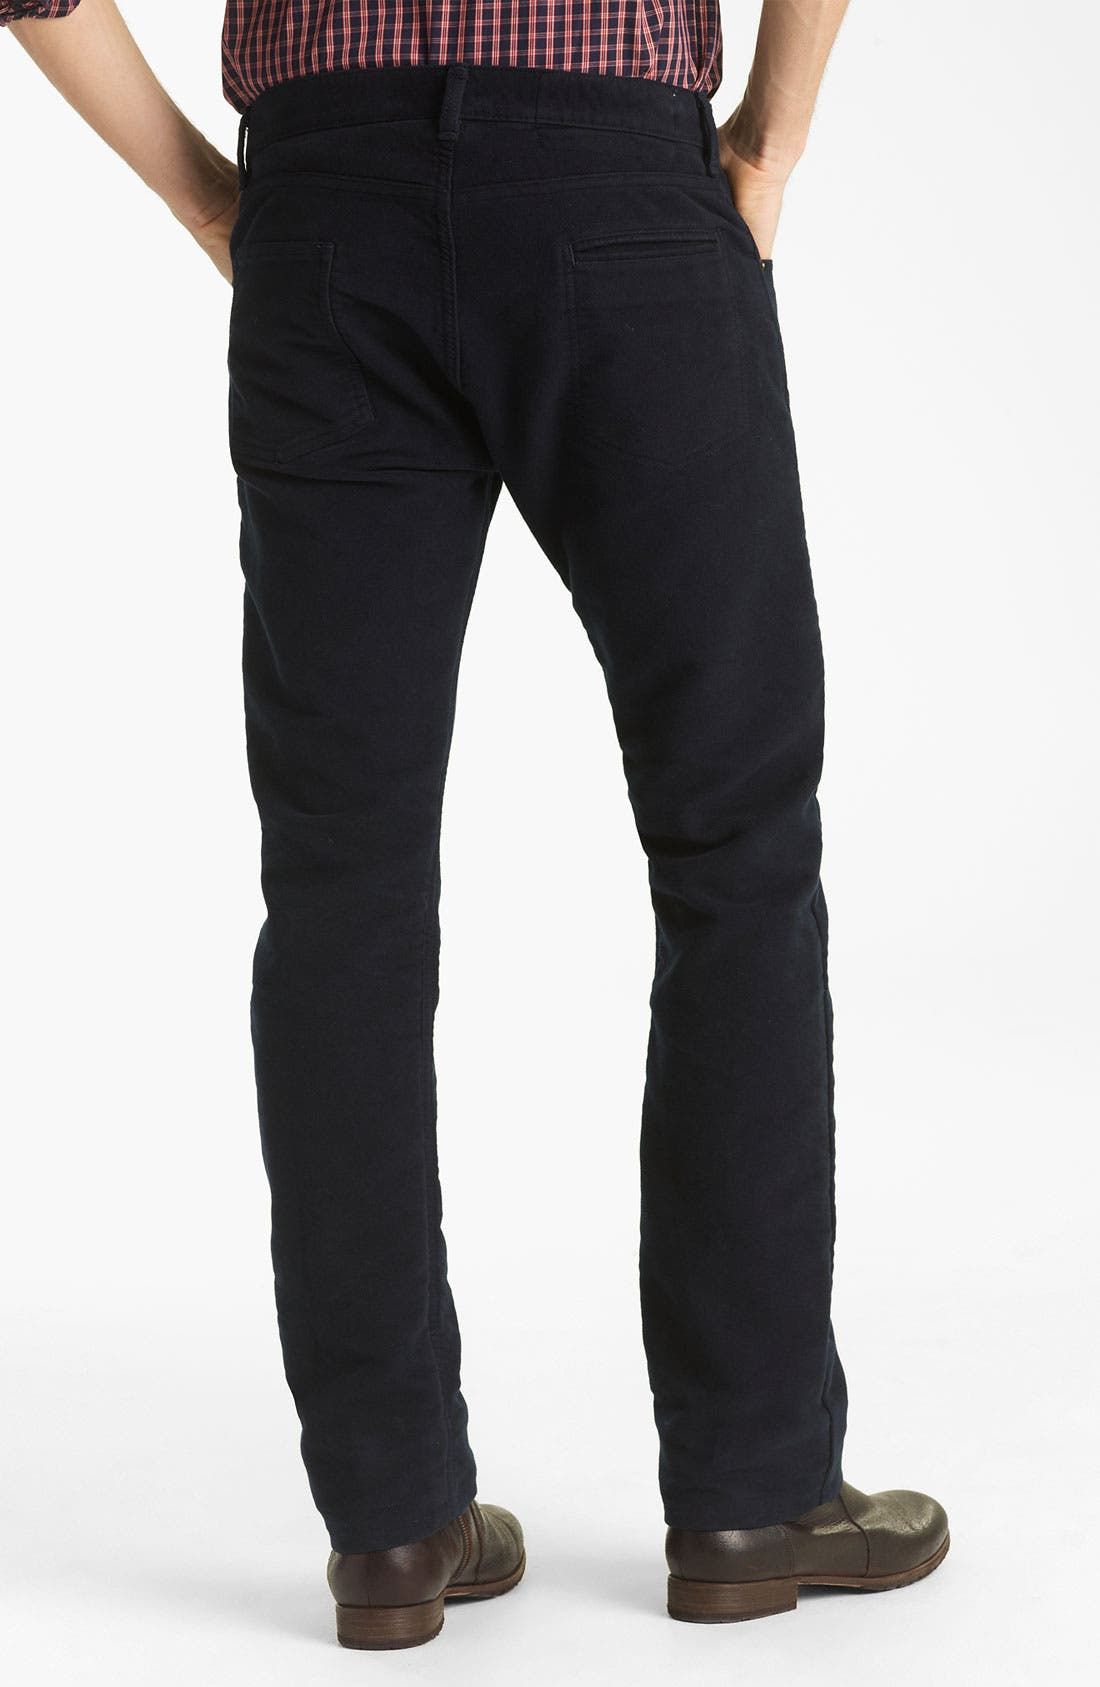 Alternate Image 1 Selected - Billy Reid Straight Leg Jeans (Navy)